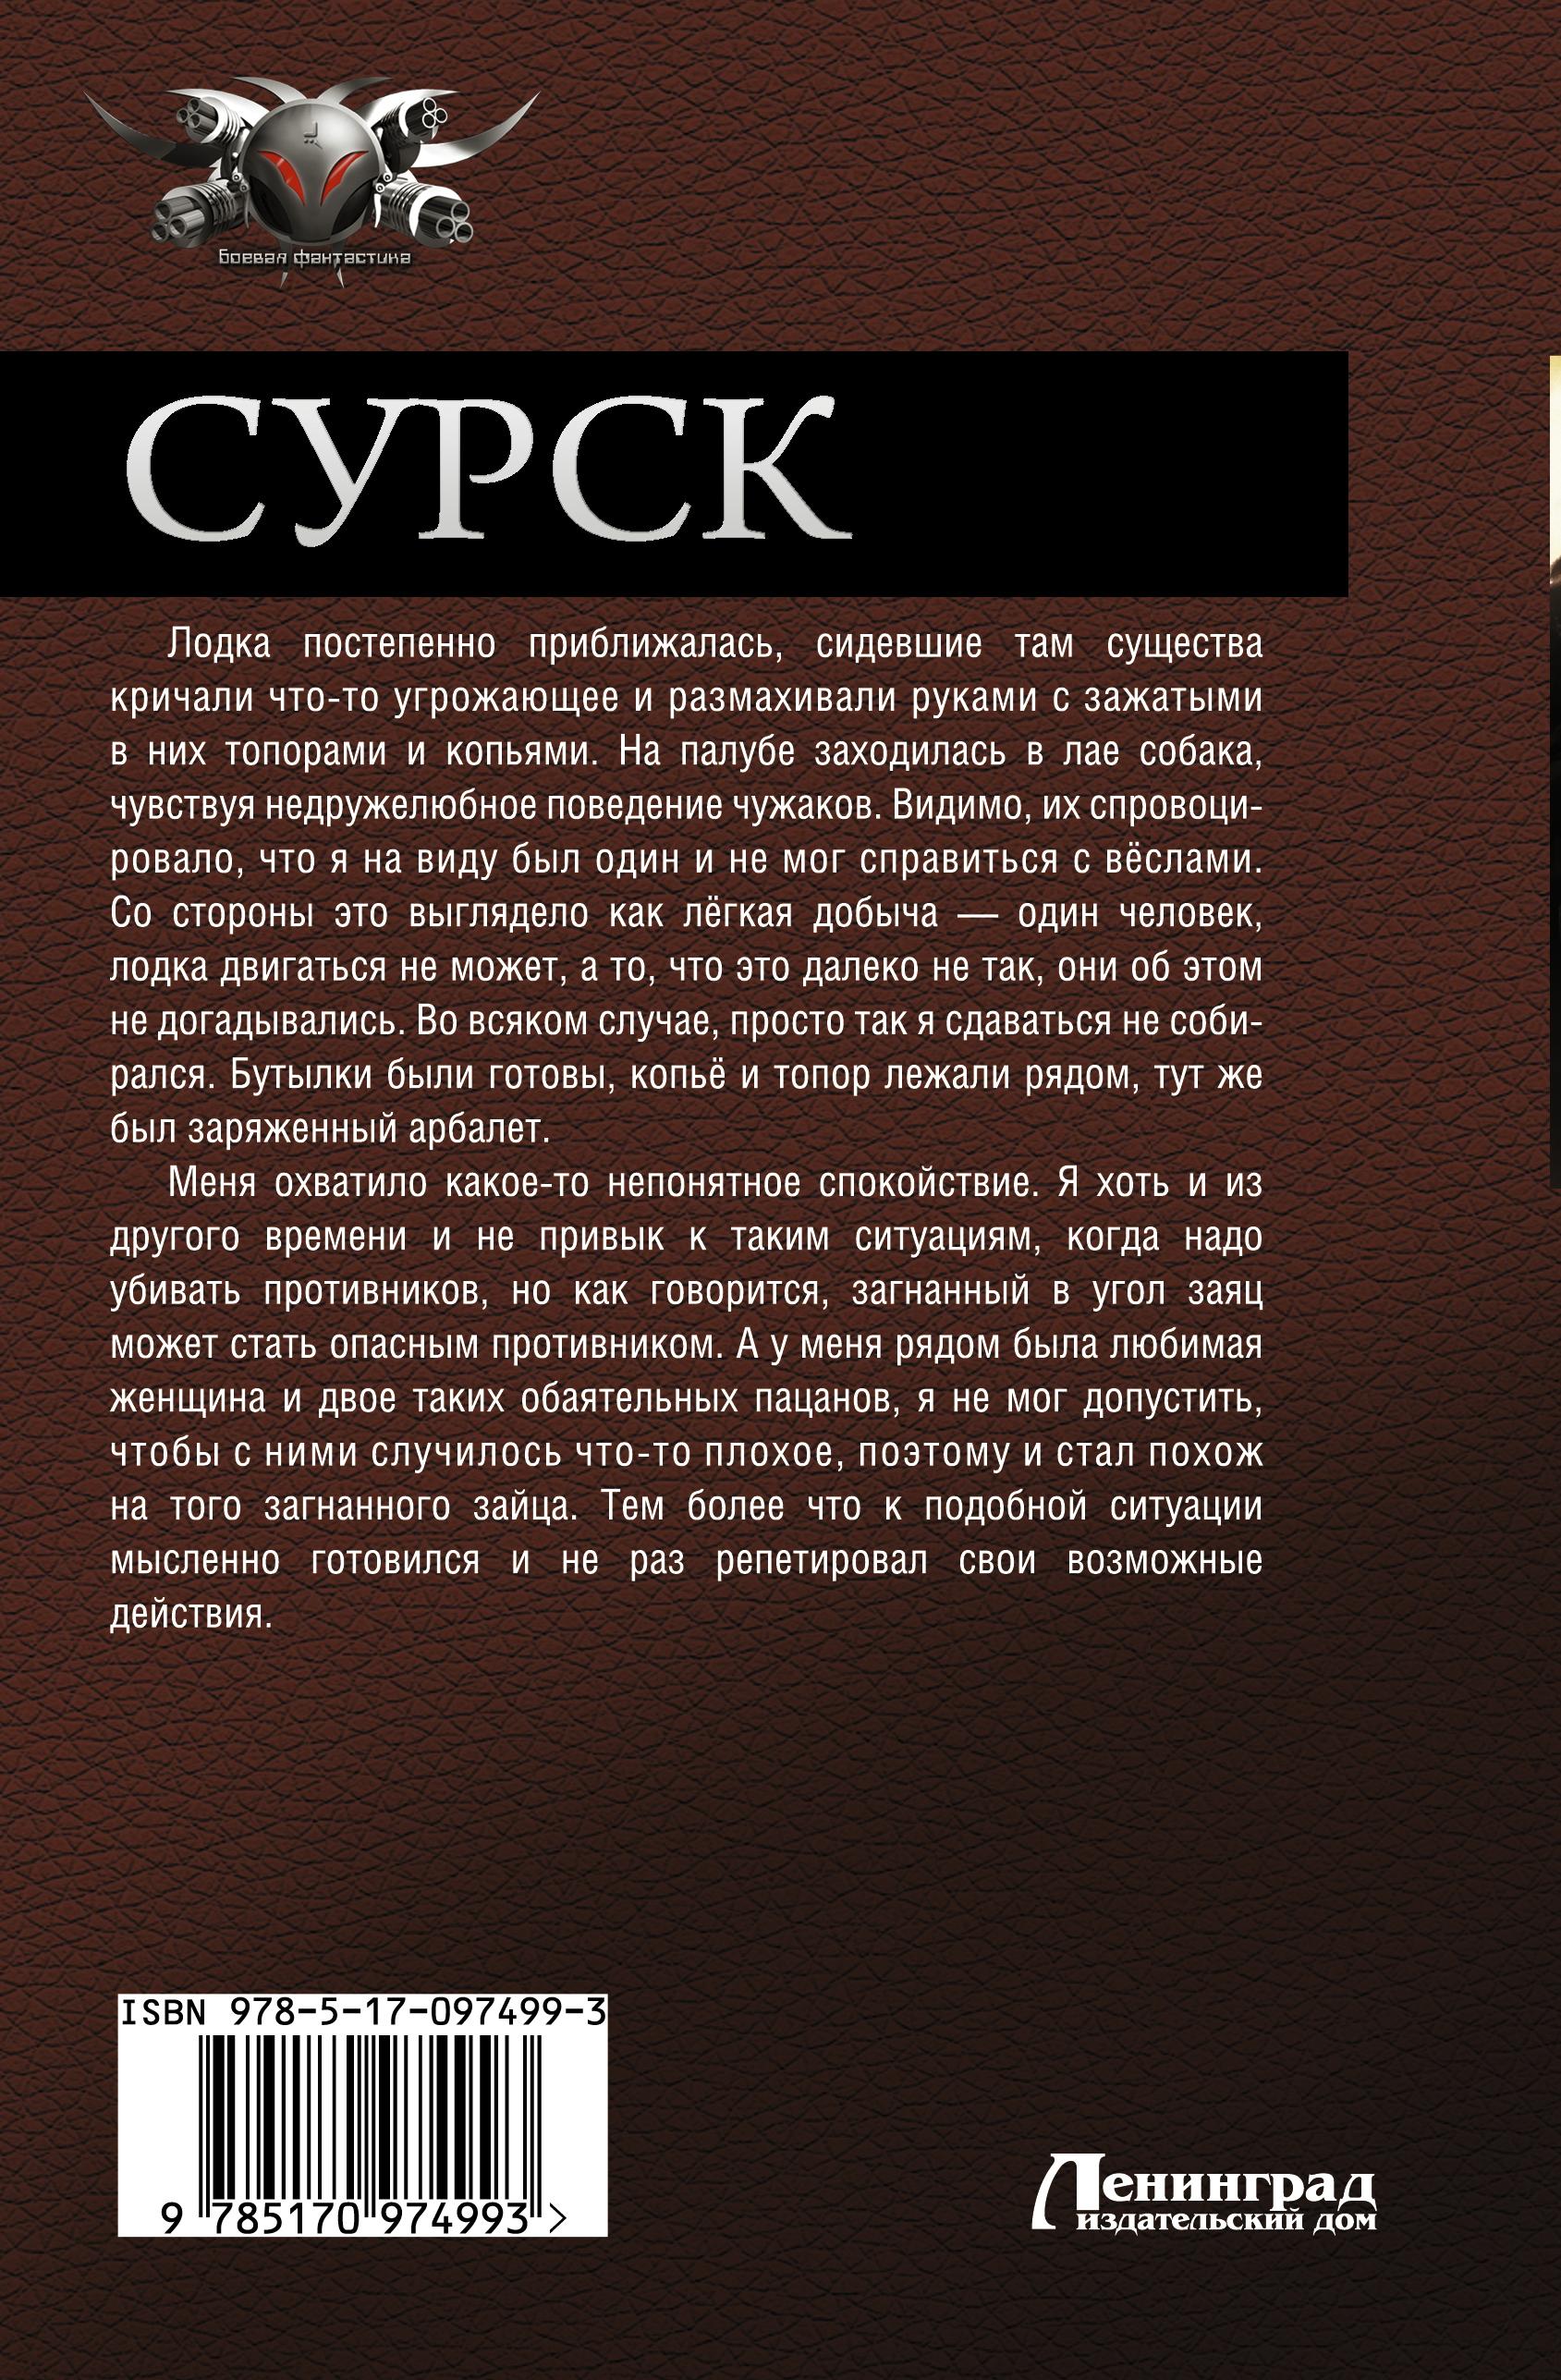 Сурск. Скворцов Владимир Николаевич